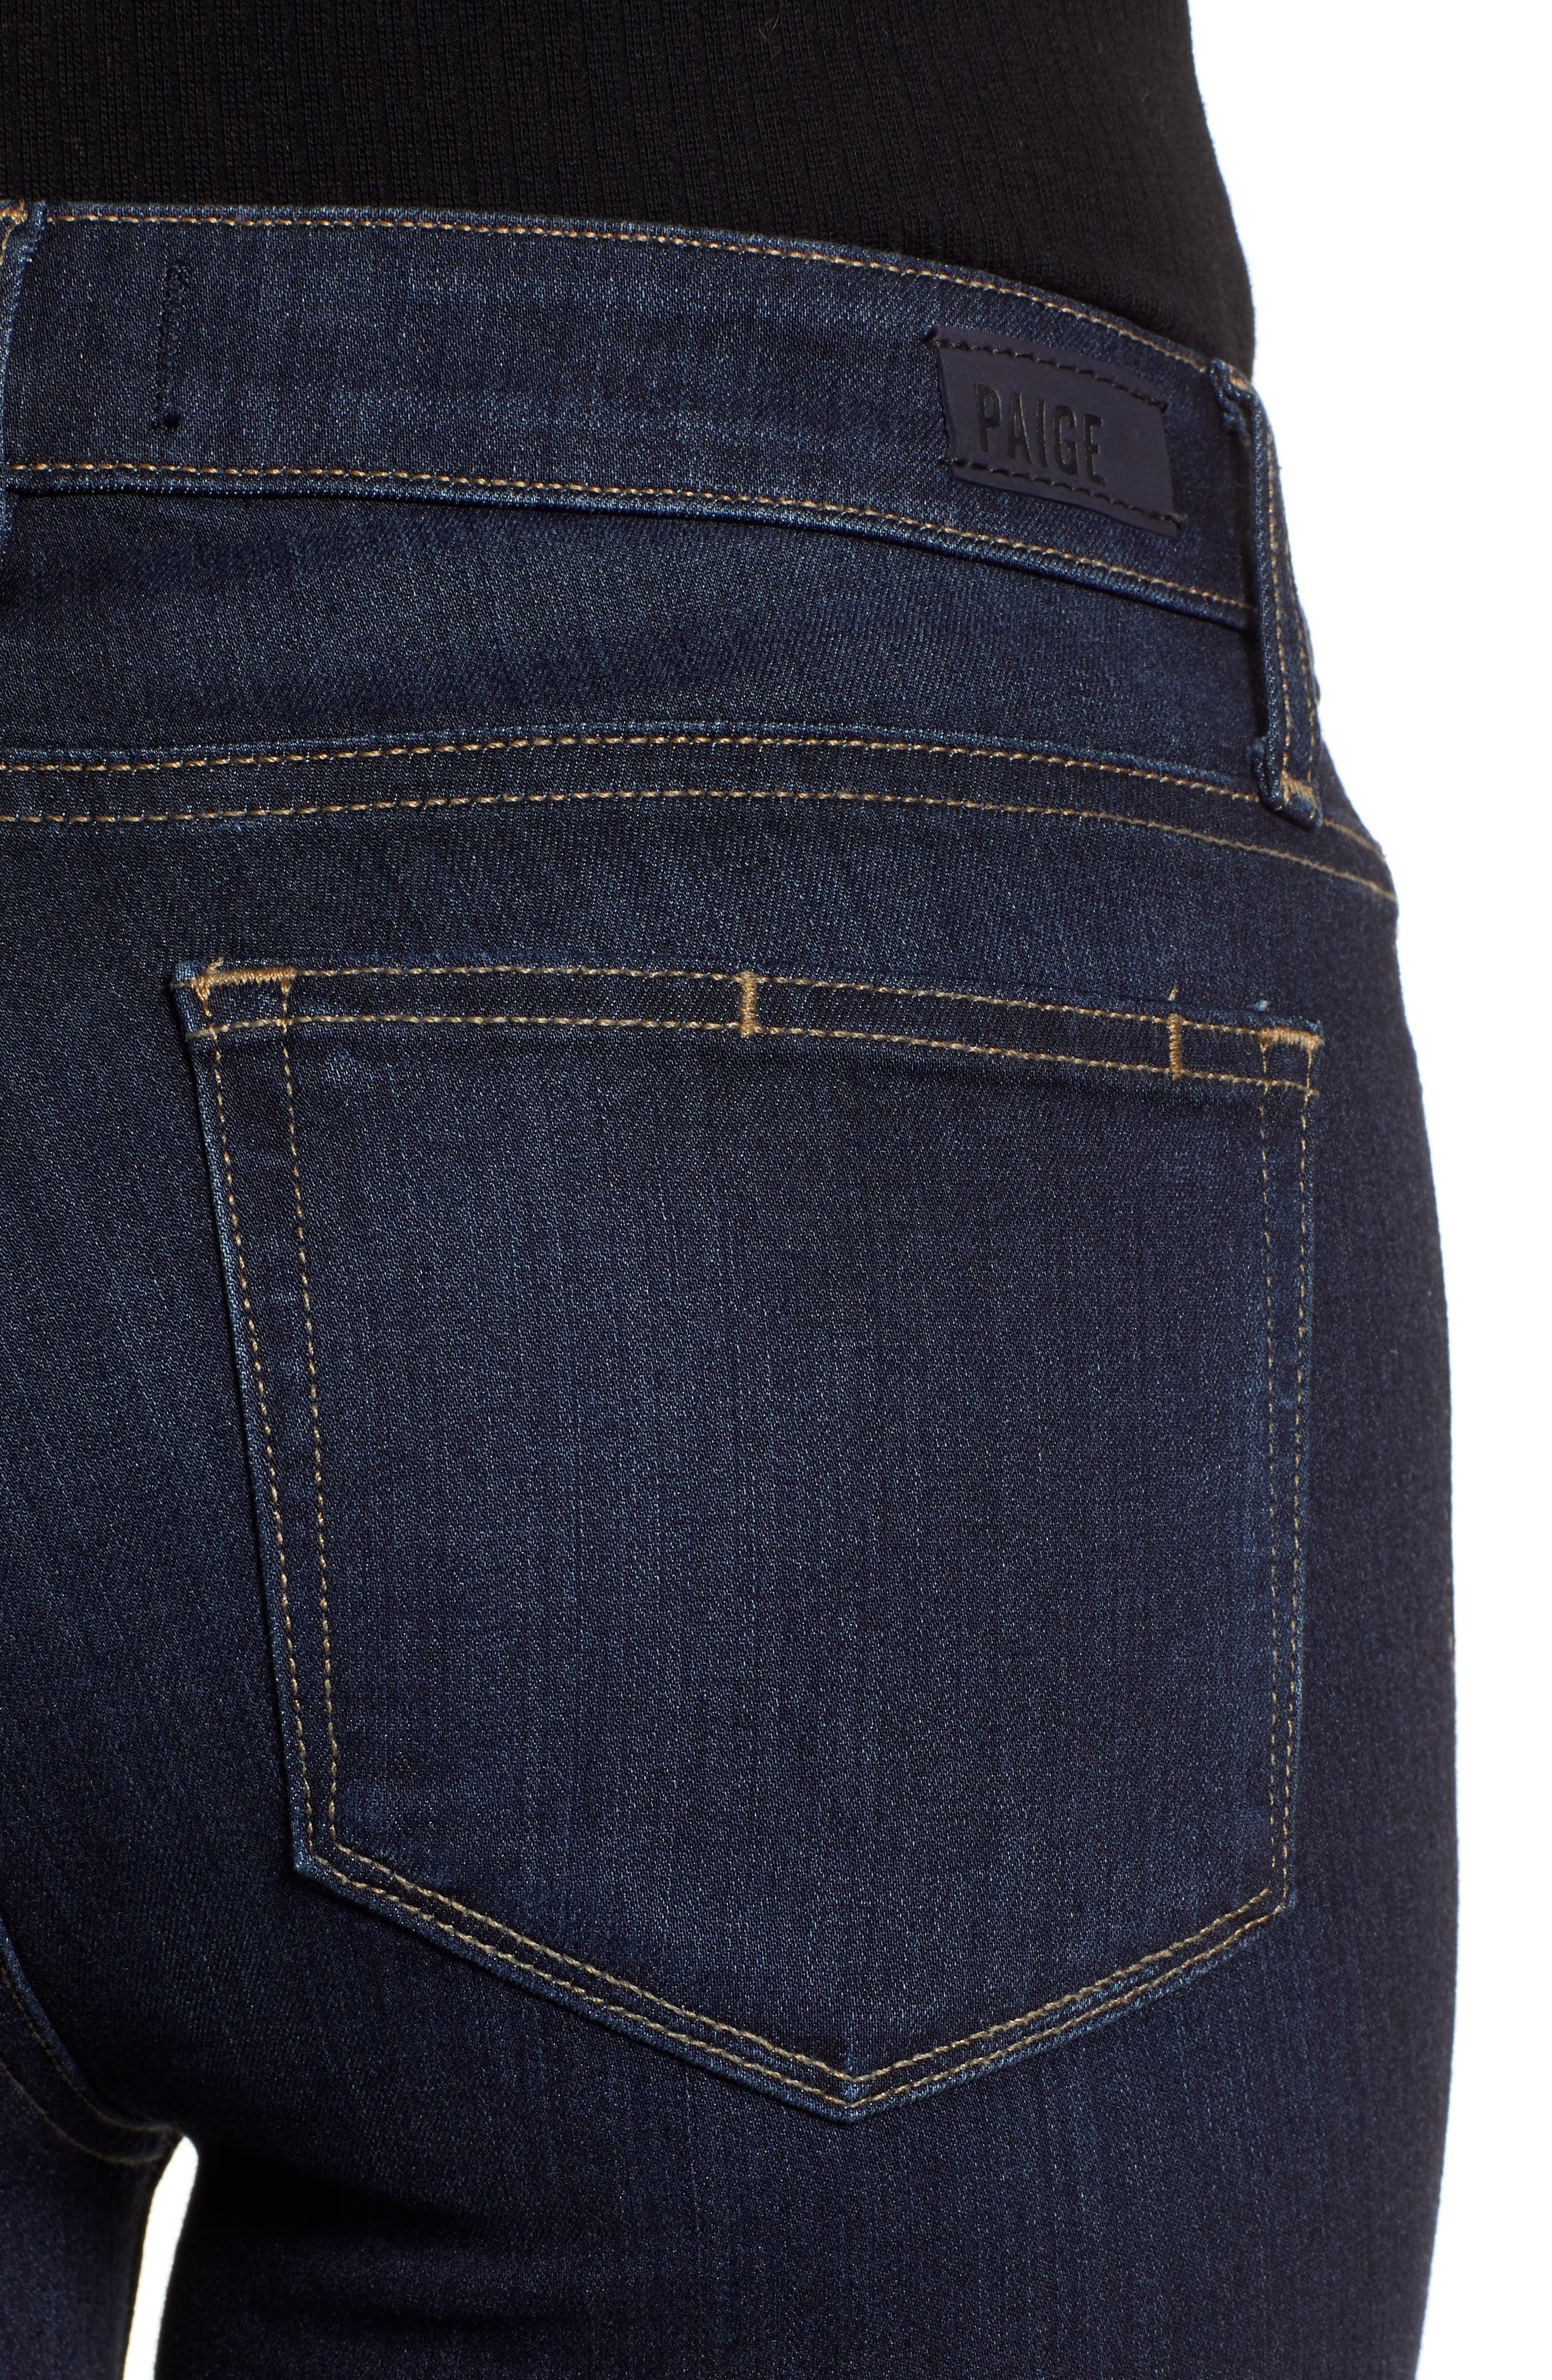 Transcend - Manhattan High Waist Bootcut Jeans,                             Alternate thumbnail 4, color,                             SANIA